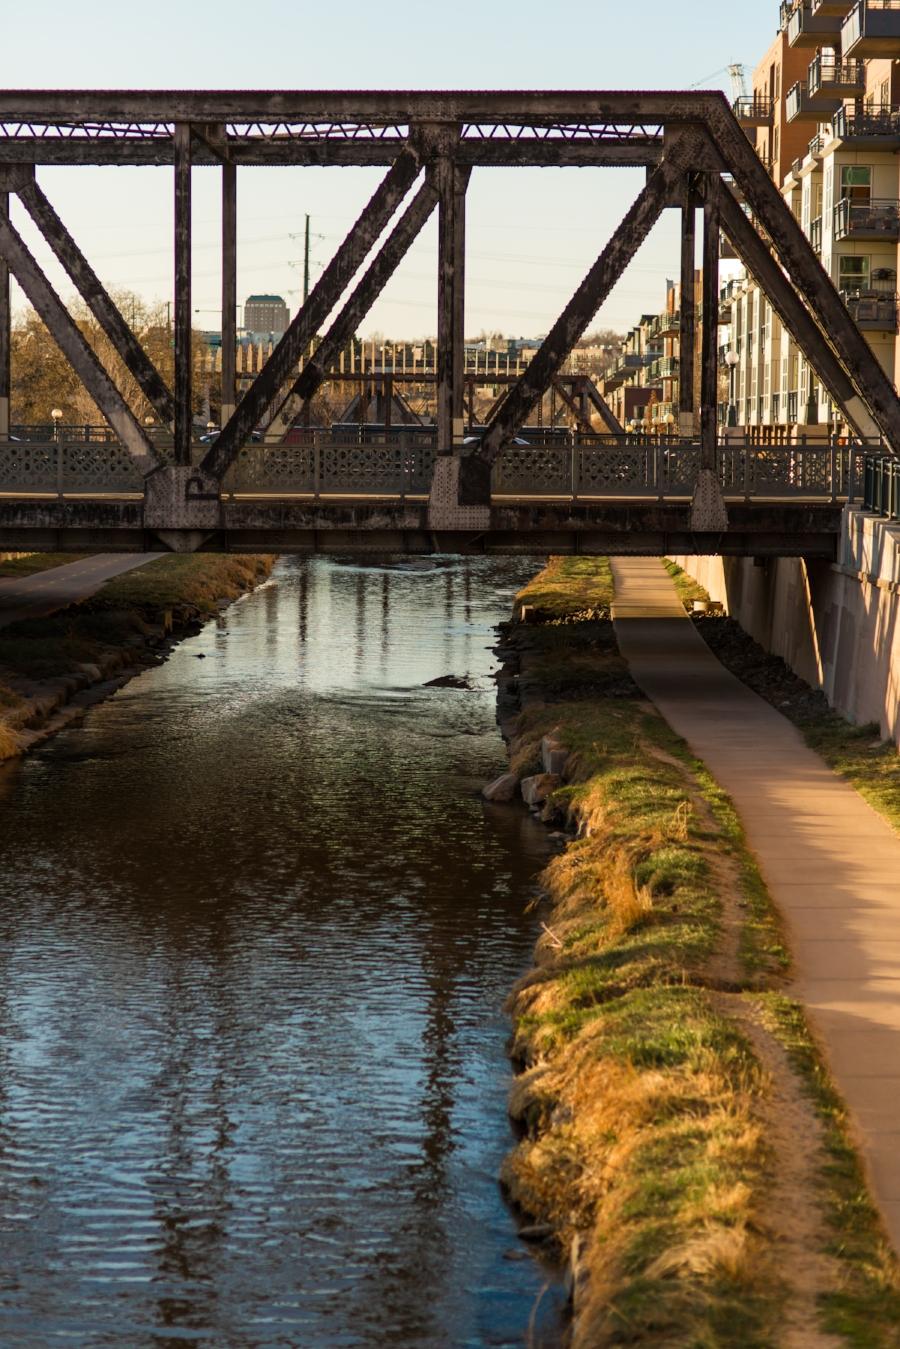 20160226-Moss-Denver-Aldabella-Photography-Milk-Glass-Production-0038.jpg